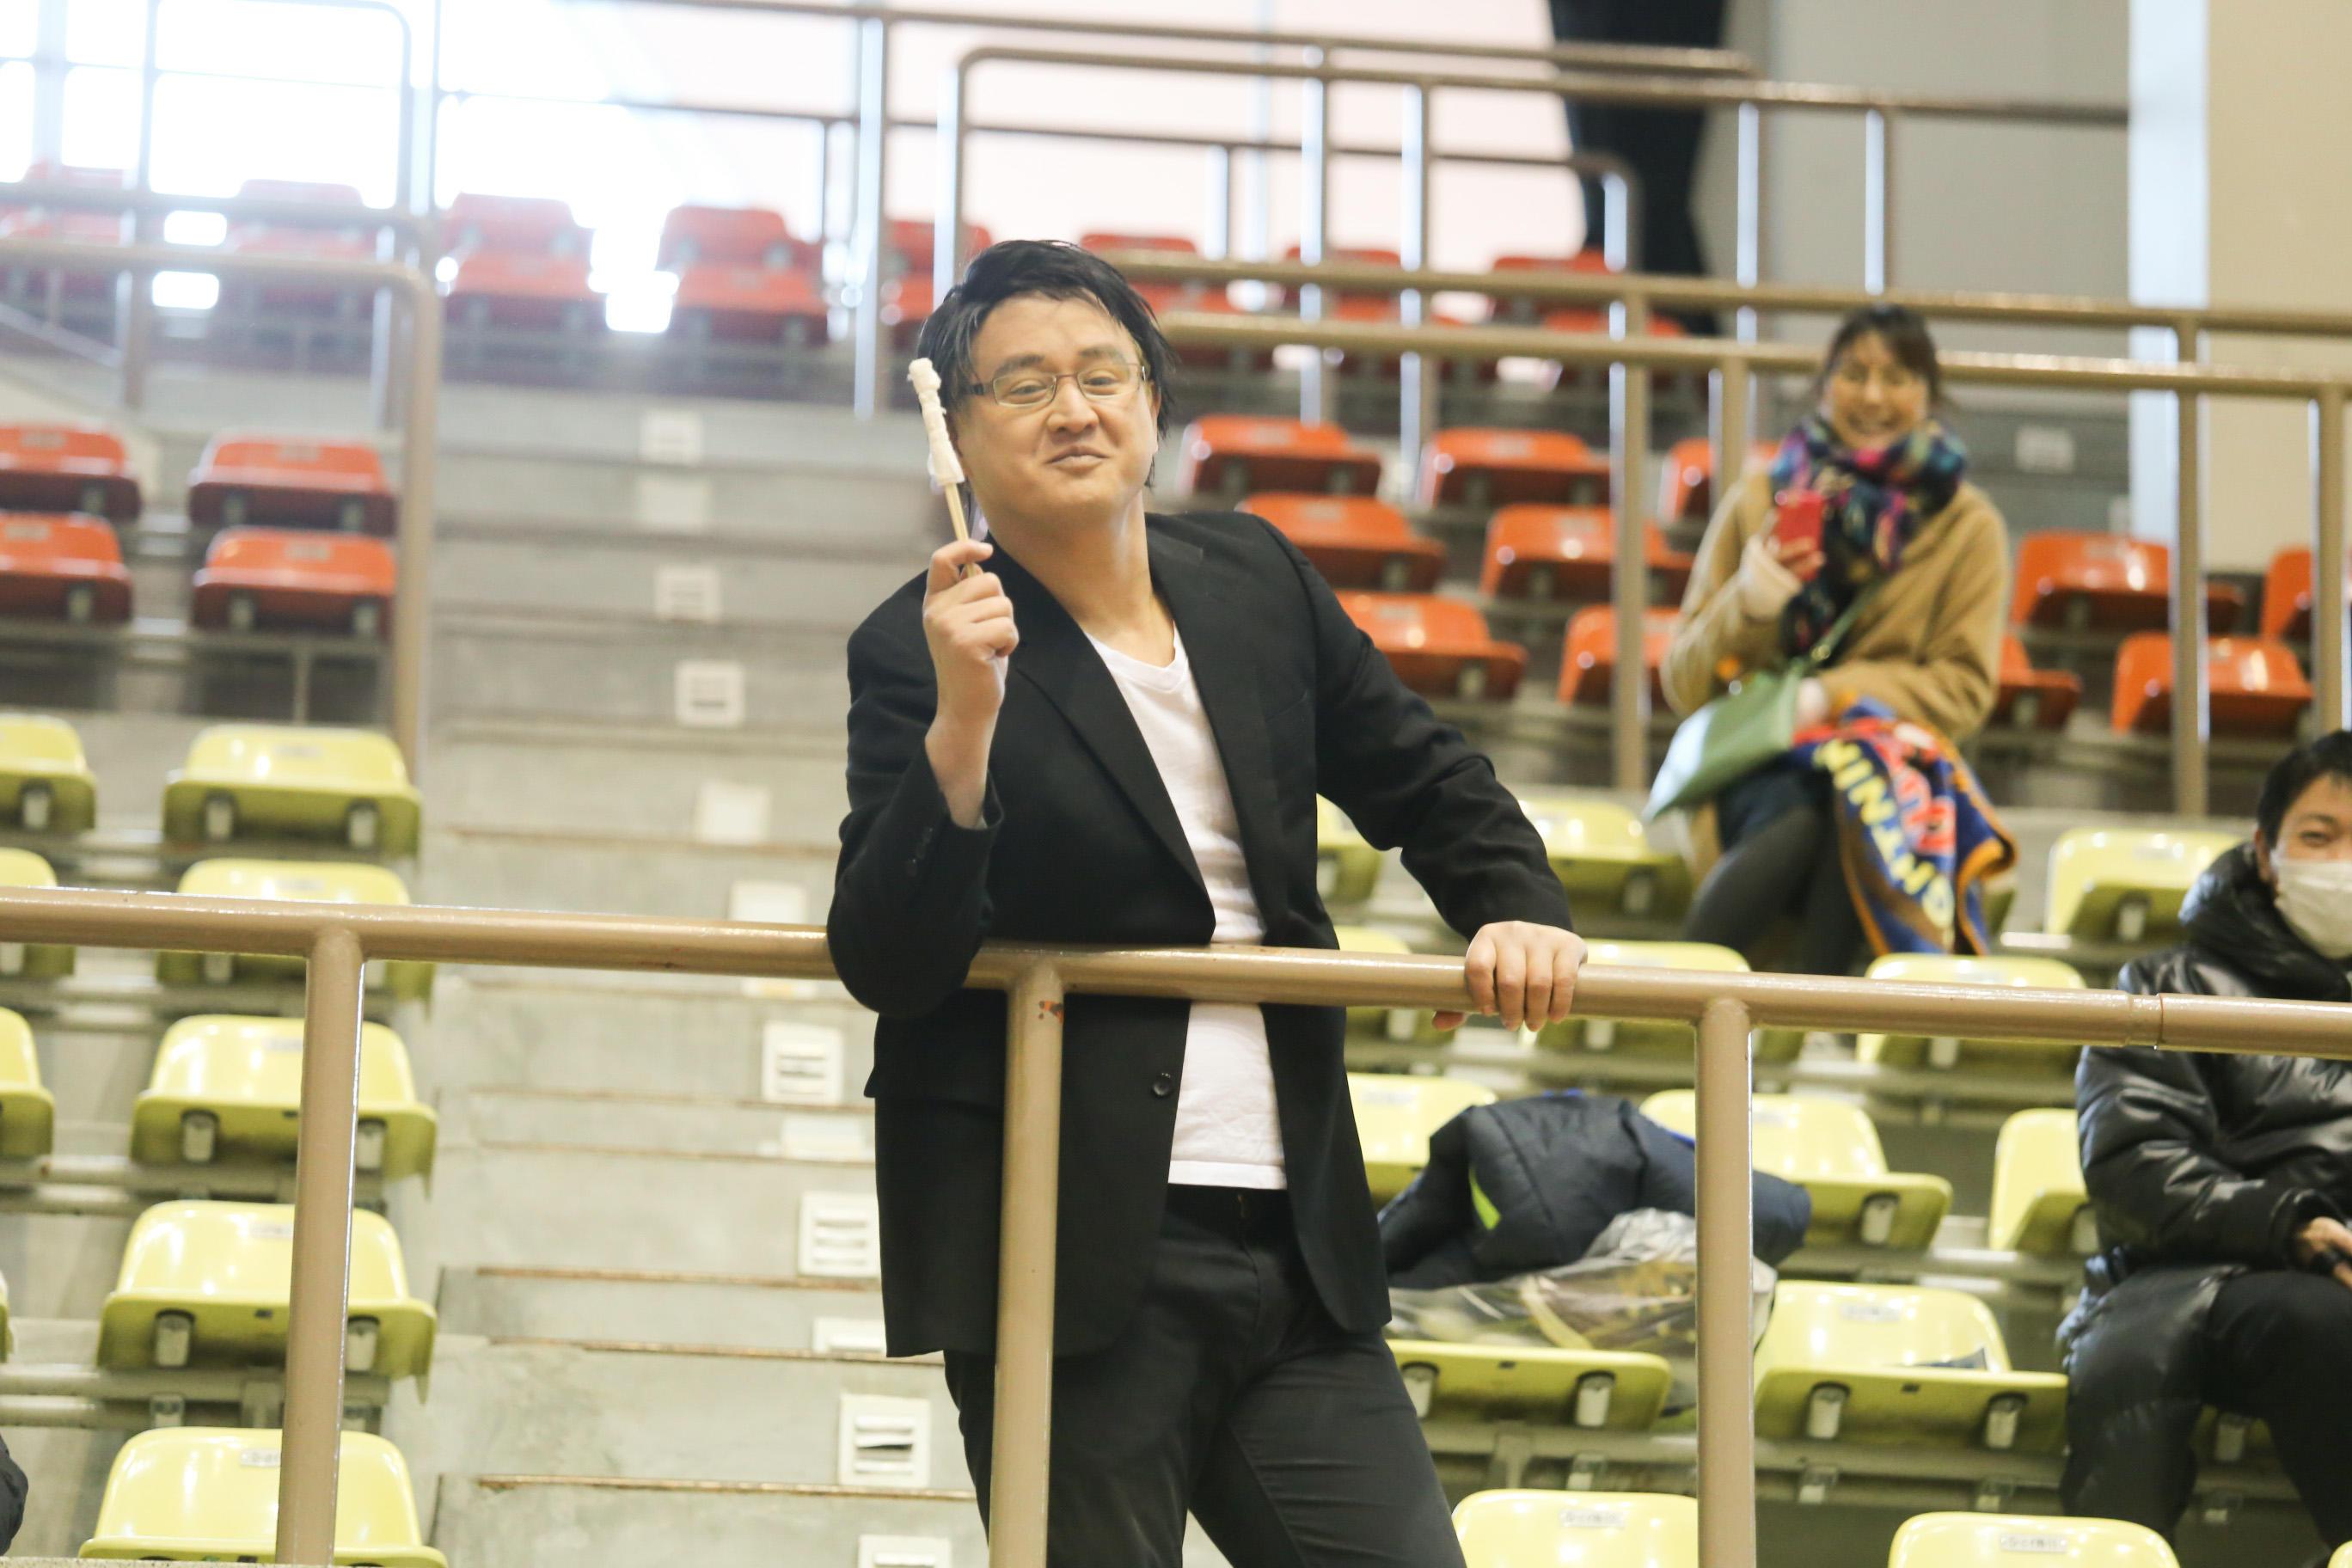 http://news.yoshimoto.co.jp/20171129024252-5087d01b416107ff1e72acf7c6df7eae99f68d33.jpg